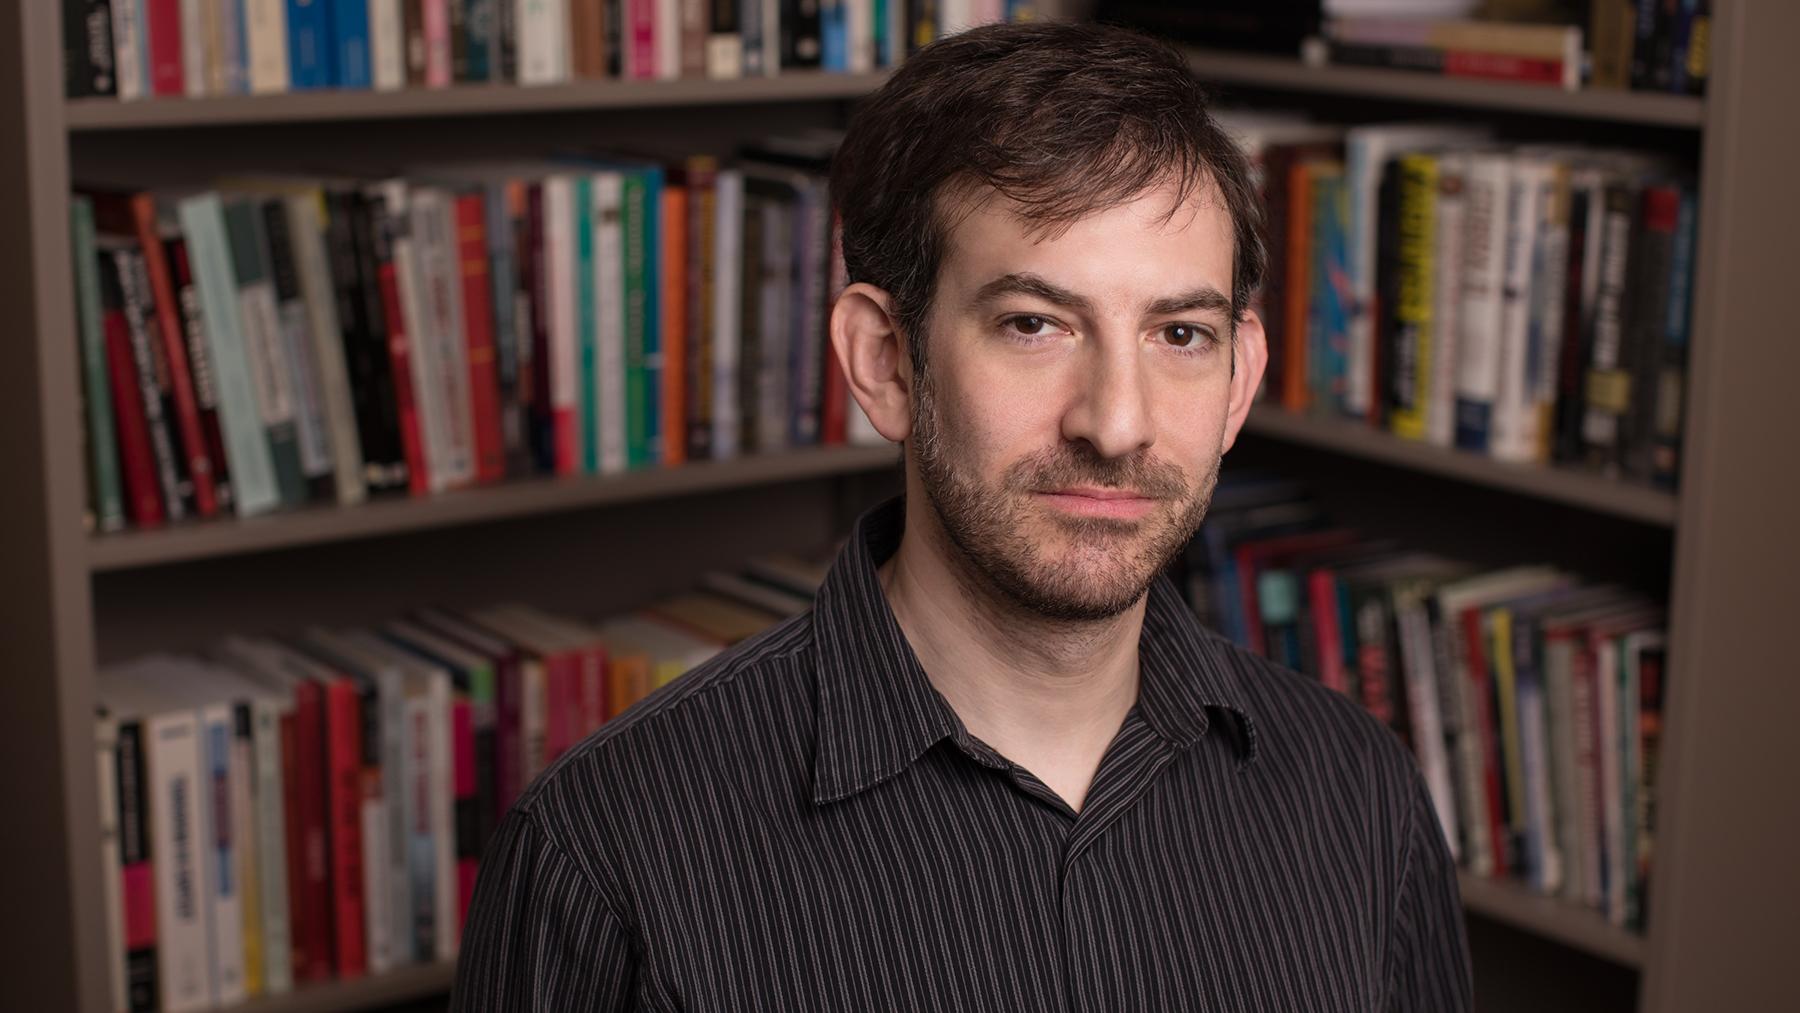 Political science professor Nicholas Grossman. Photo by L. Brian Stauffer